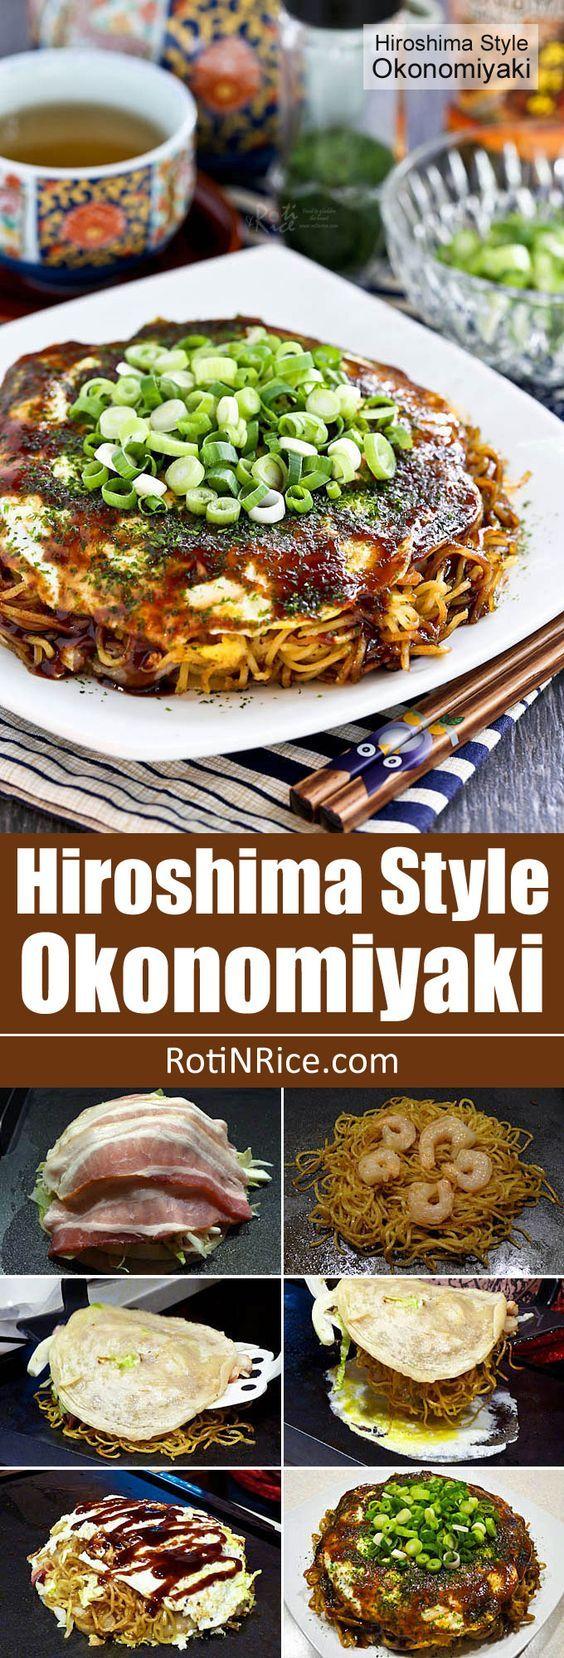 Hiroshima Style Okonomiyaki (Japanese Layered Pancakes) - the ultimate savory pancake complete with cabbage, bacon, noodles, shrimp, and egg. So yummy! | RotiNRice.com